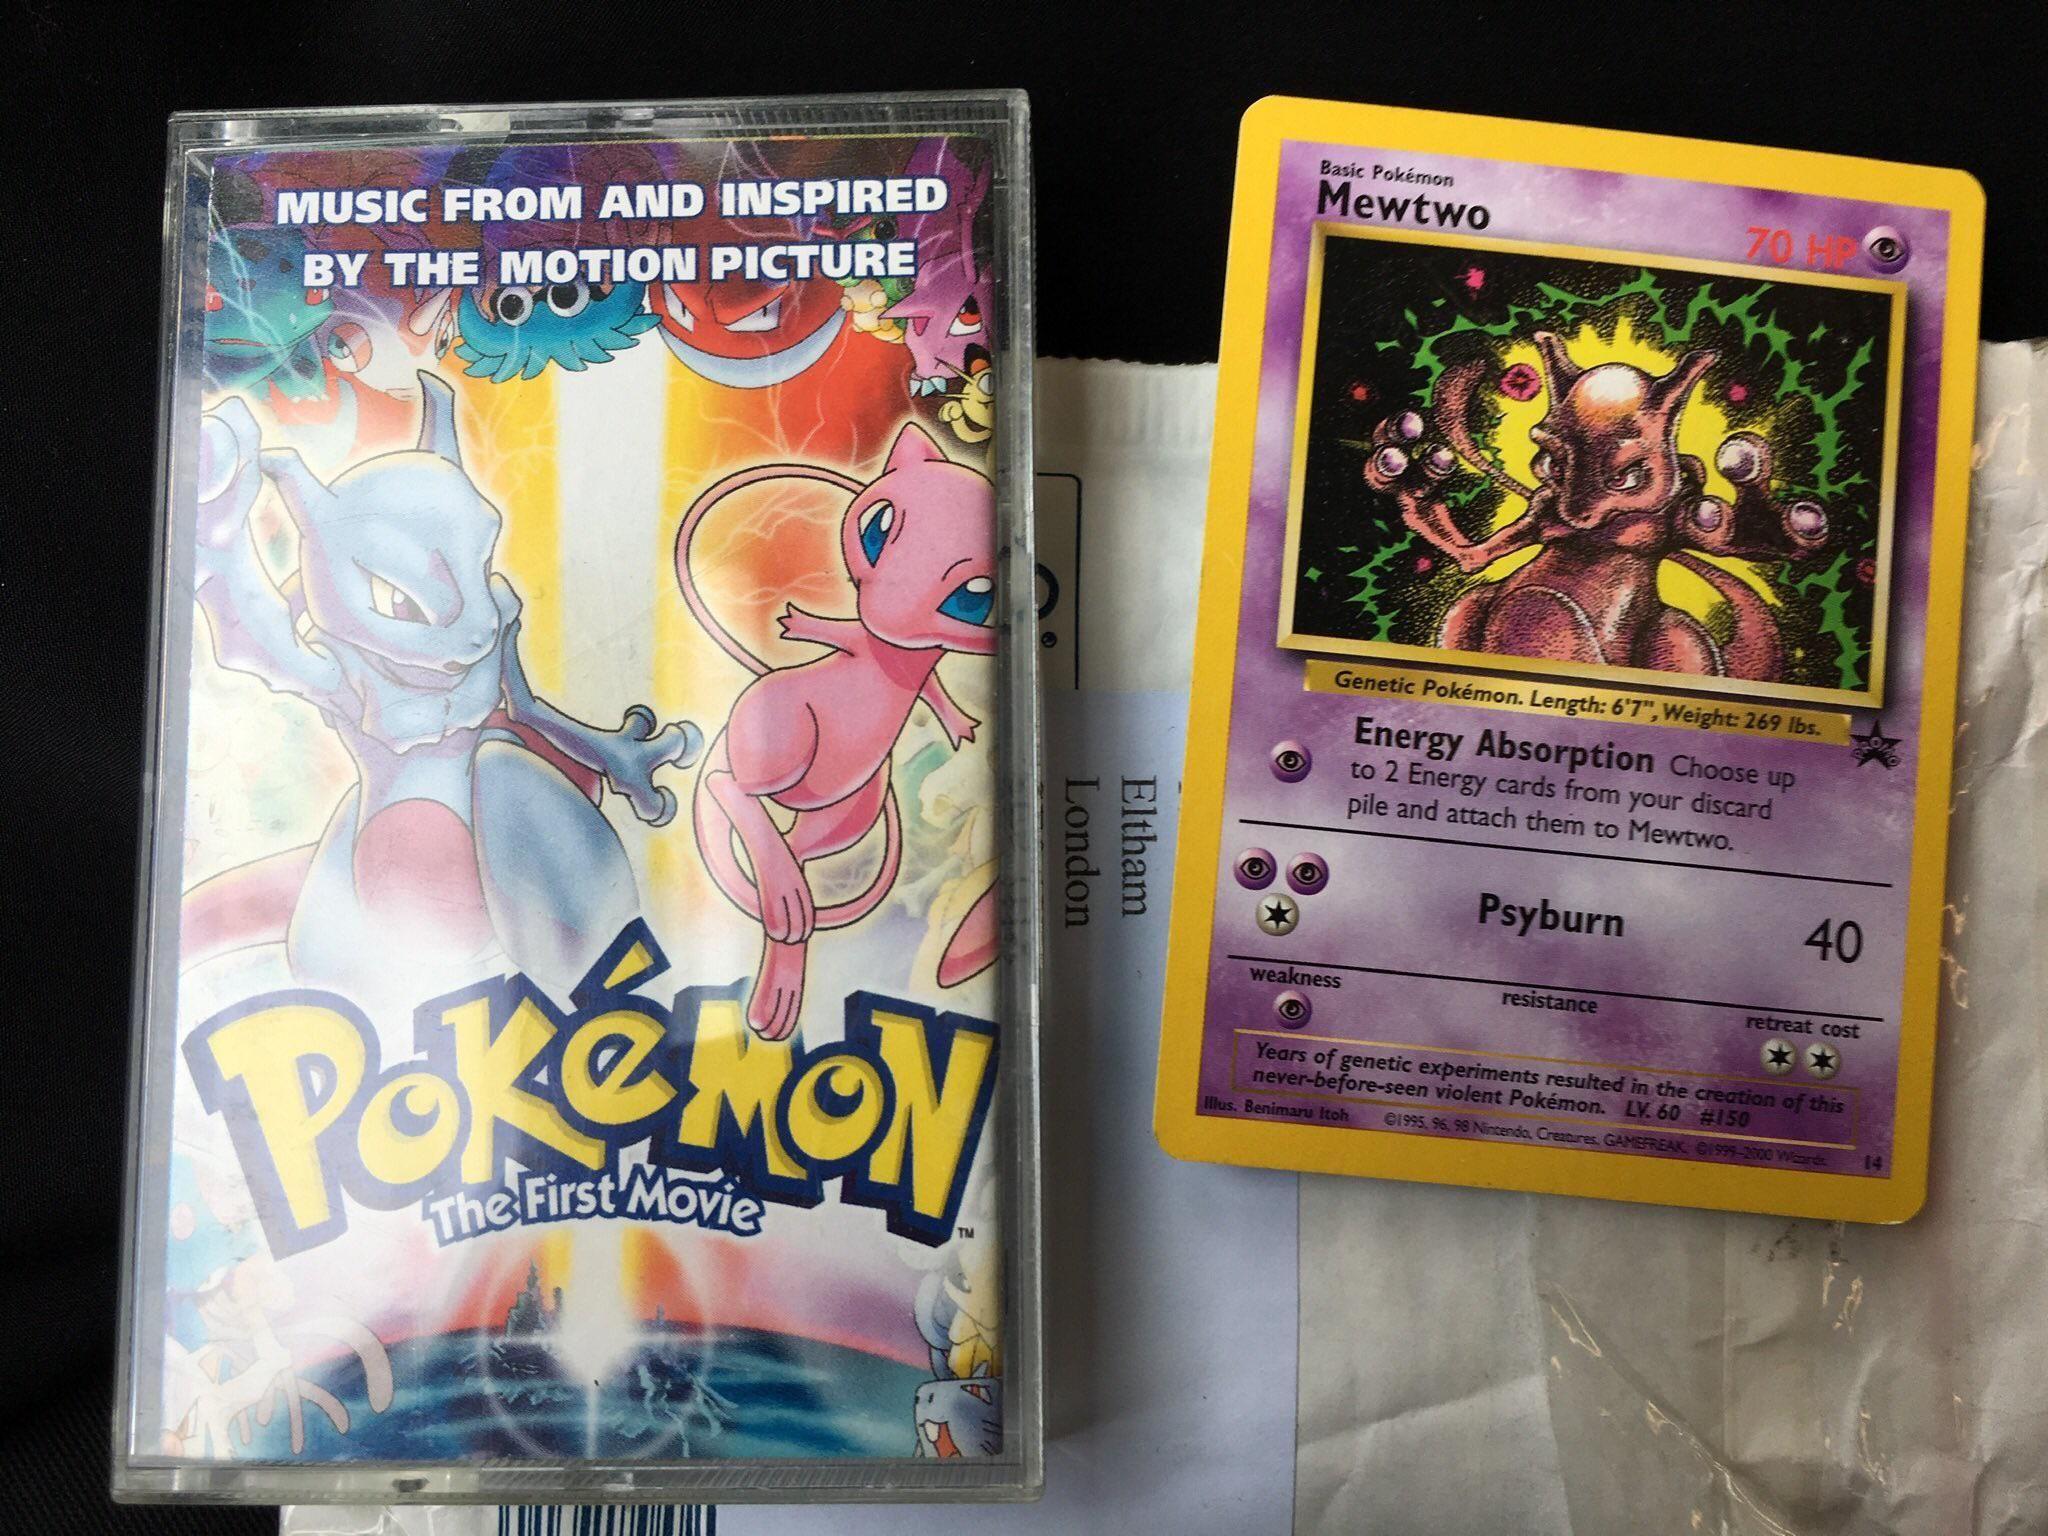 Pokemon the First Movie OST (Ft. MewTwo promo card) : cassetteculture |  Pokemon, Hình ảnh, Pikachu